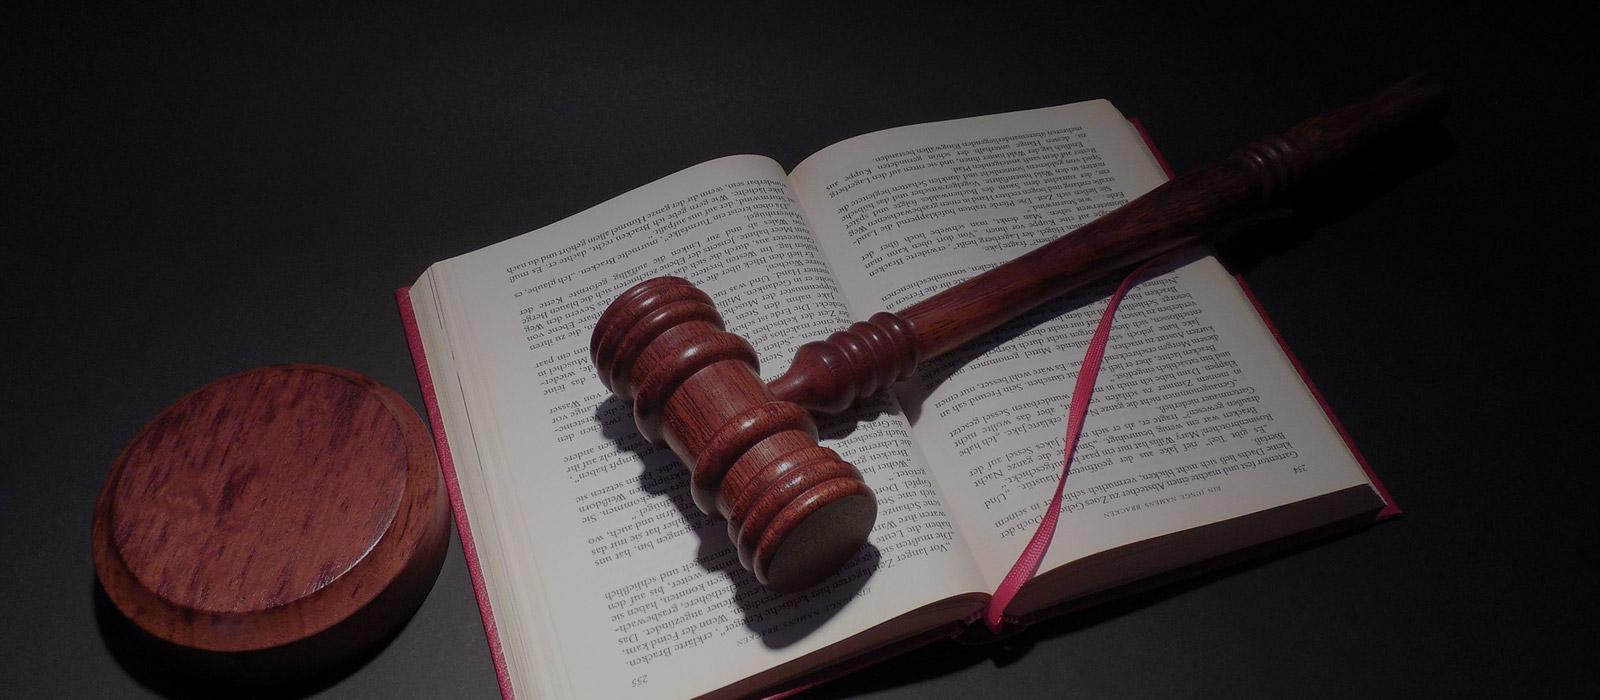 Stetson Law